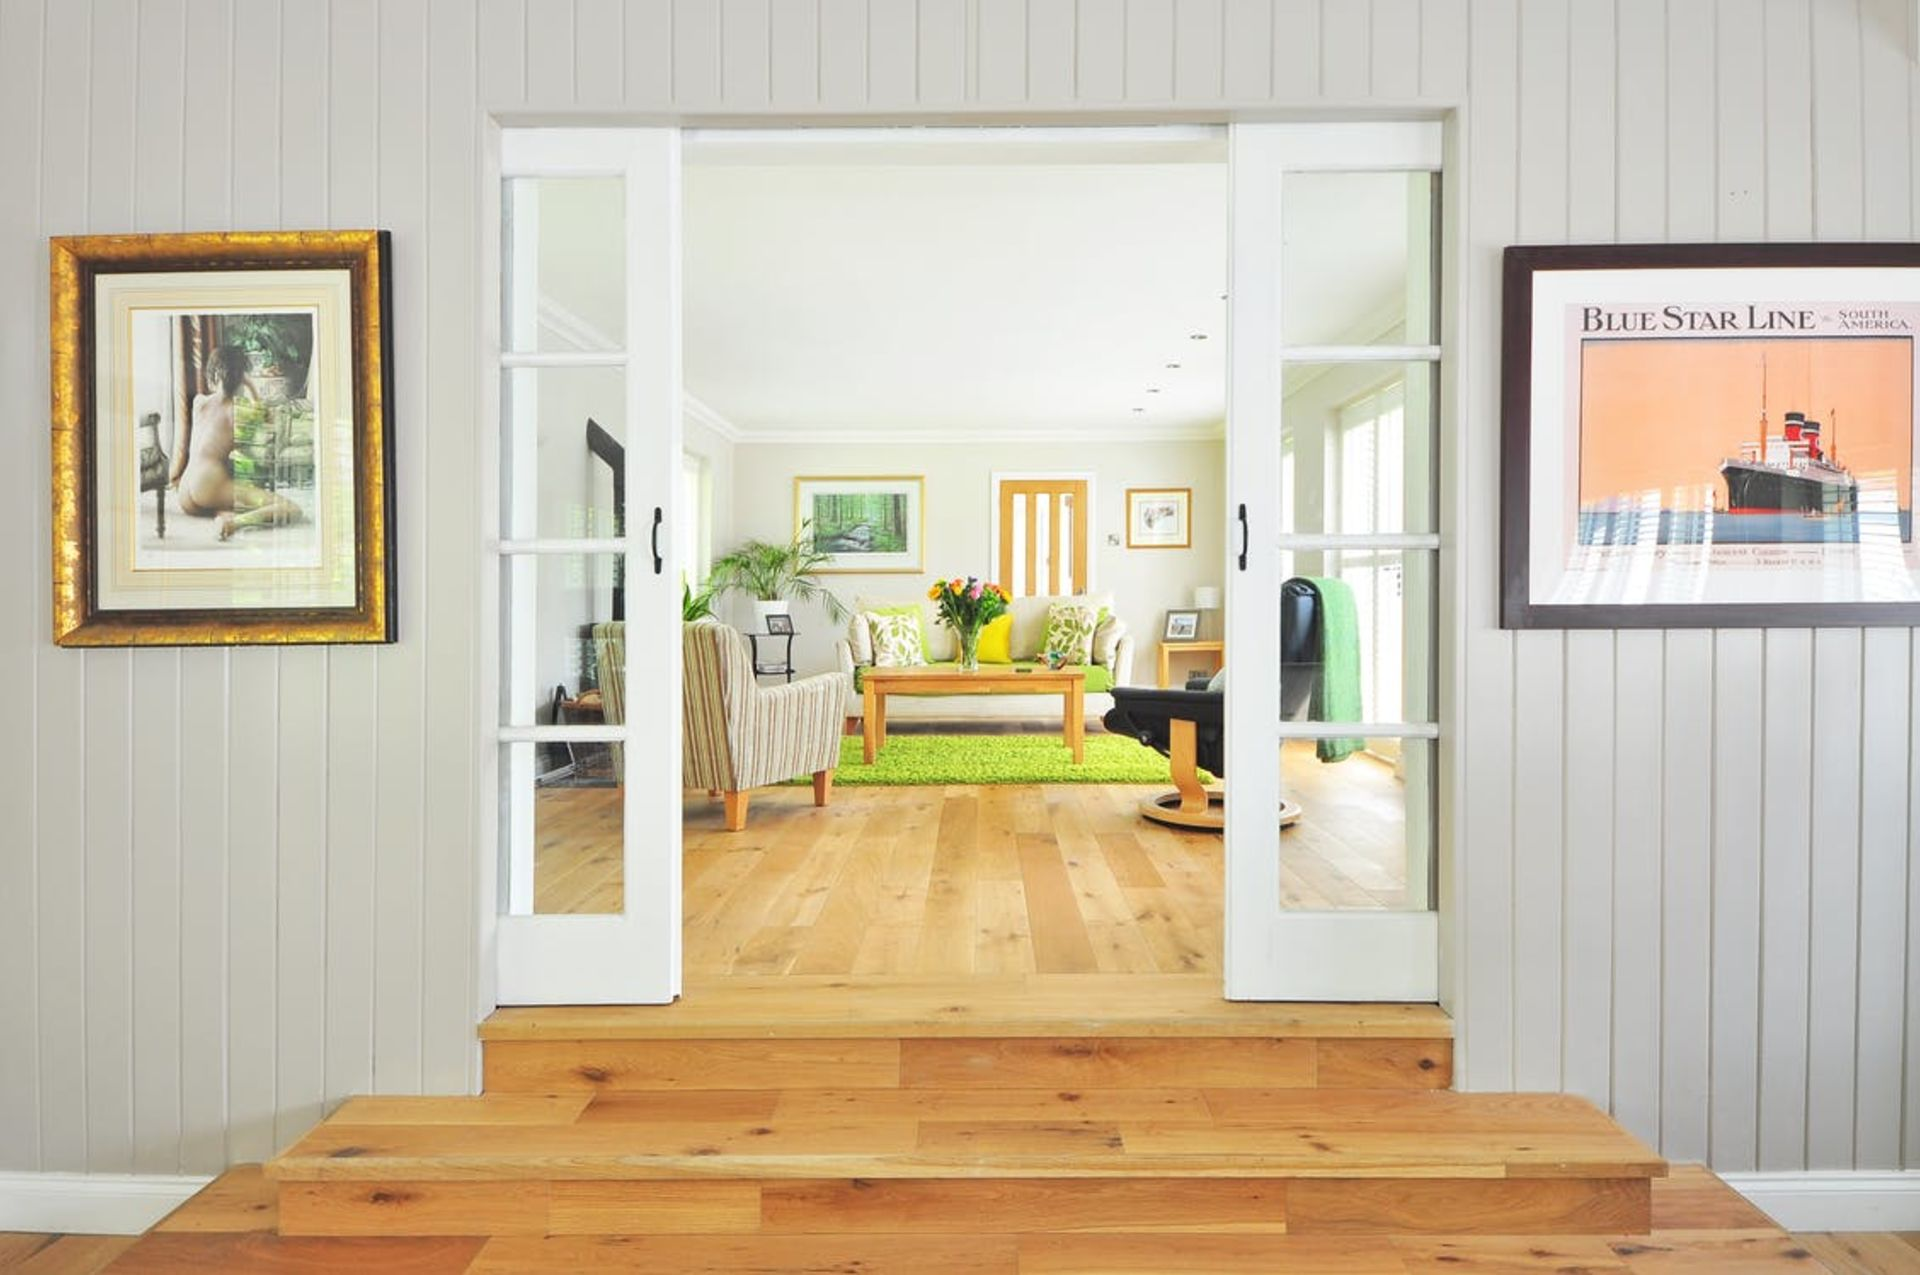 August 2015 San Antonio Home Sales Report